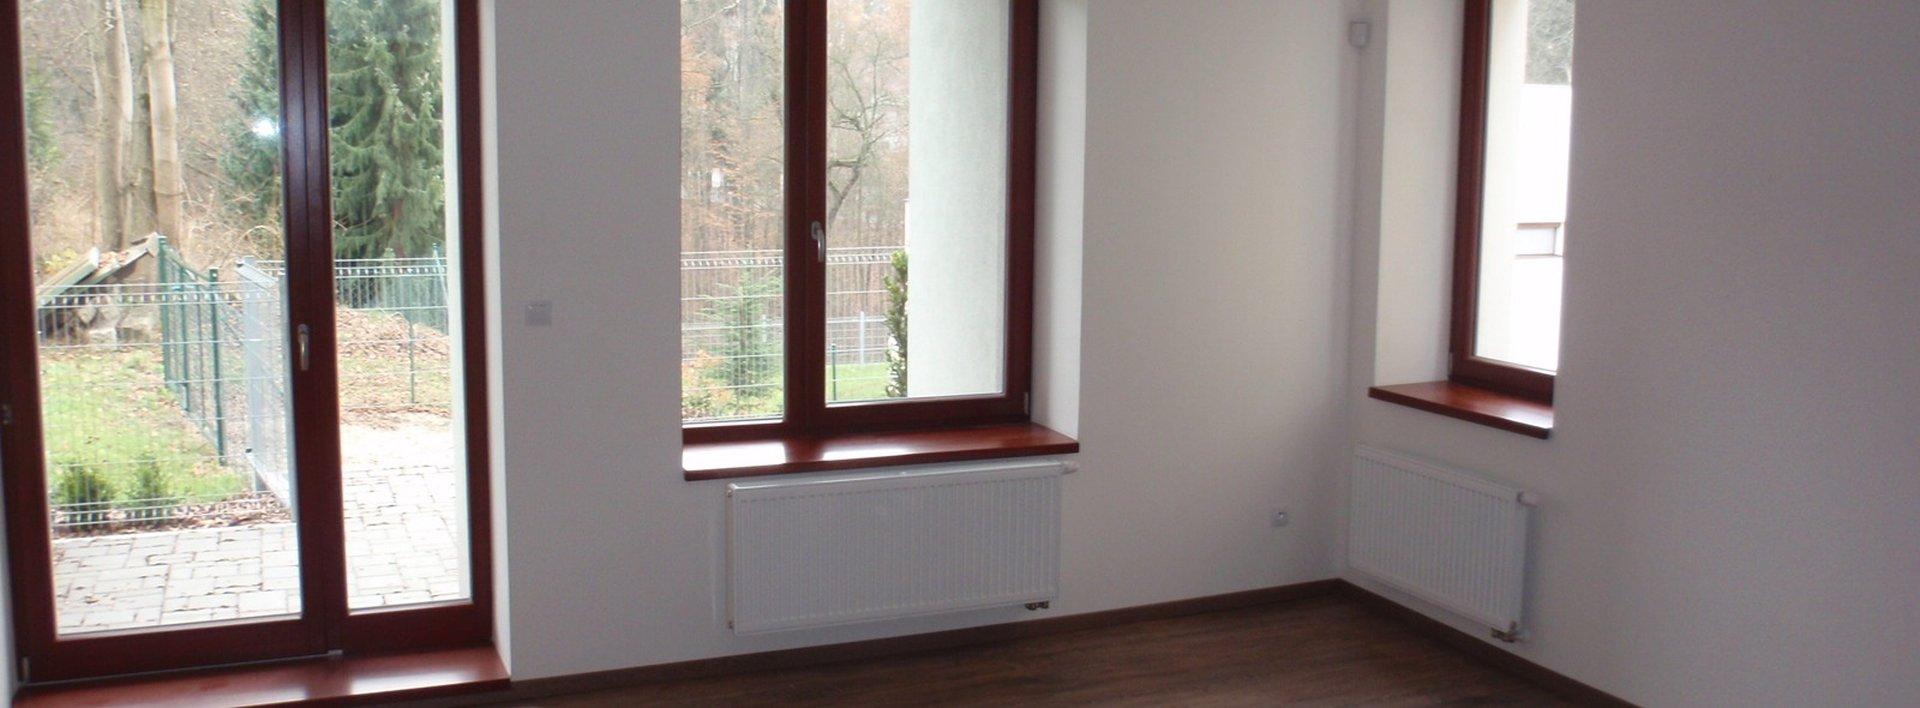 Pronájem, Byty 1+kk, 38 m², Riegrova, Liberec I, Ev.č.: N49225